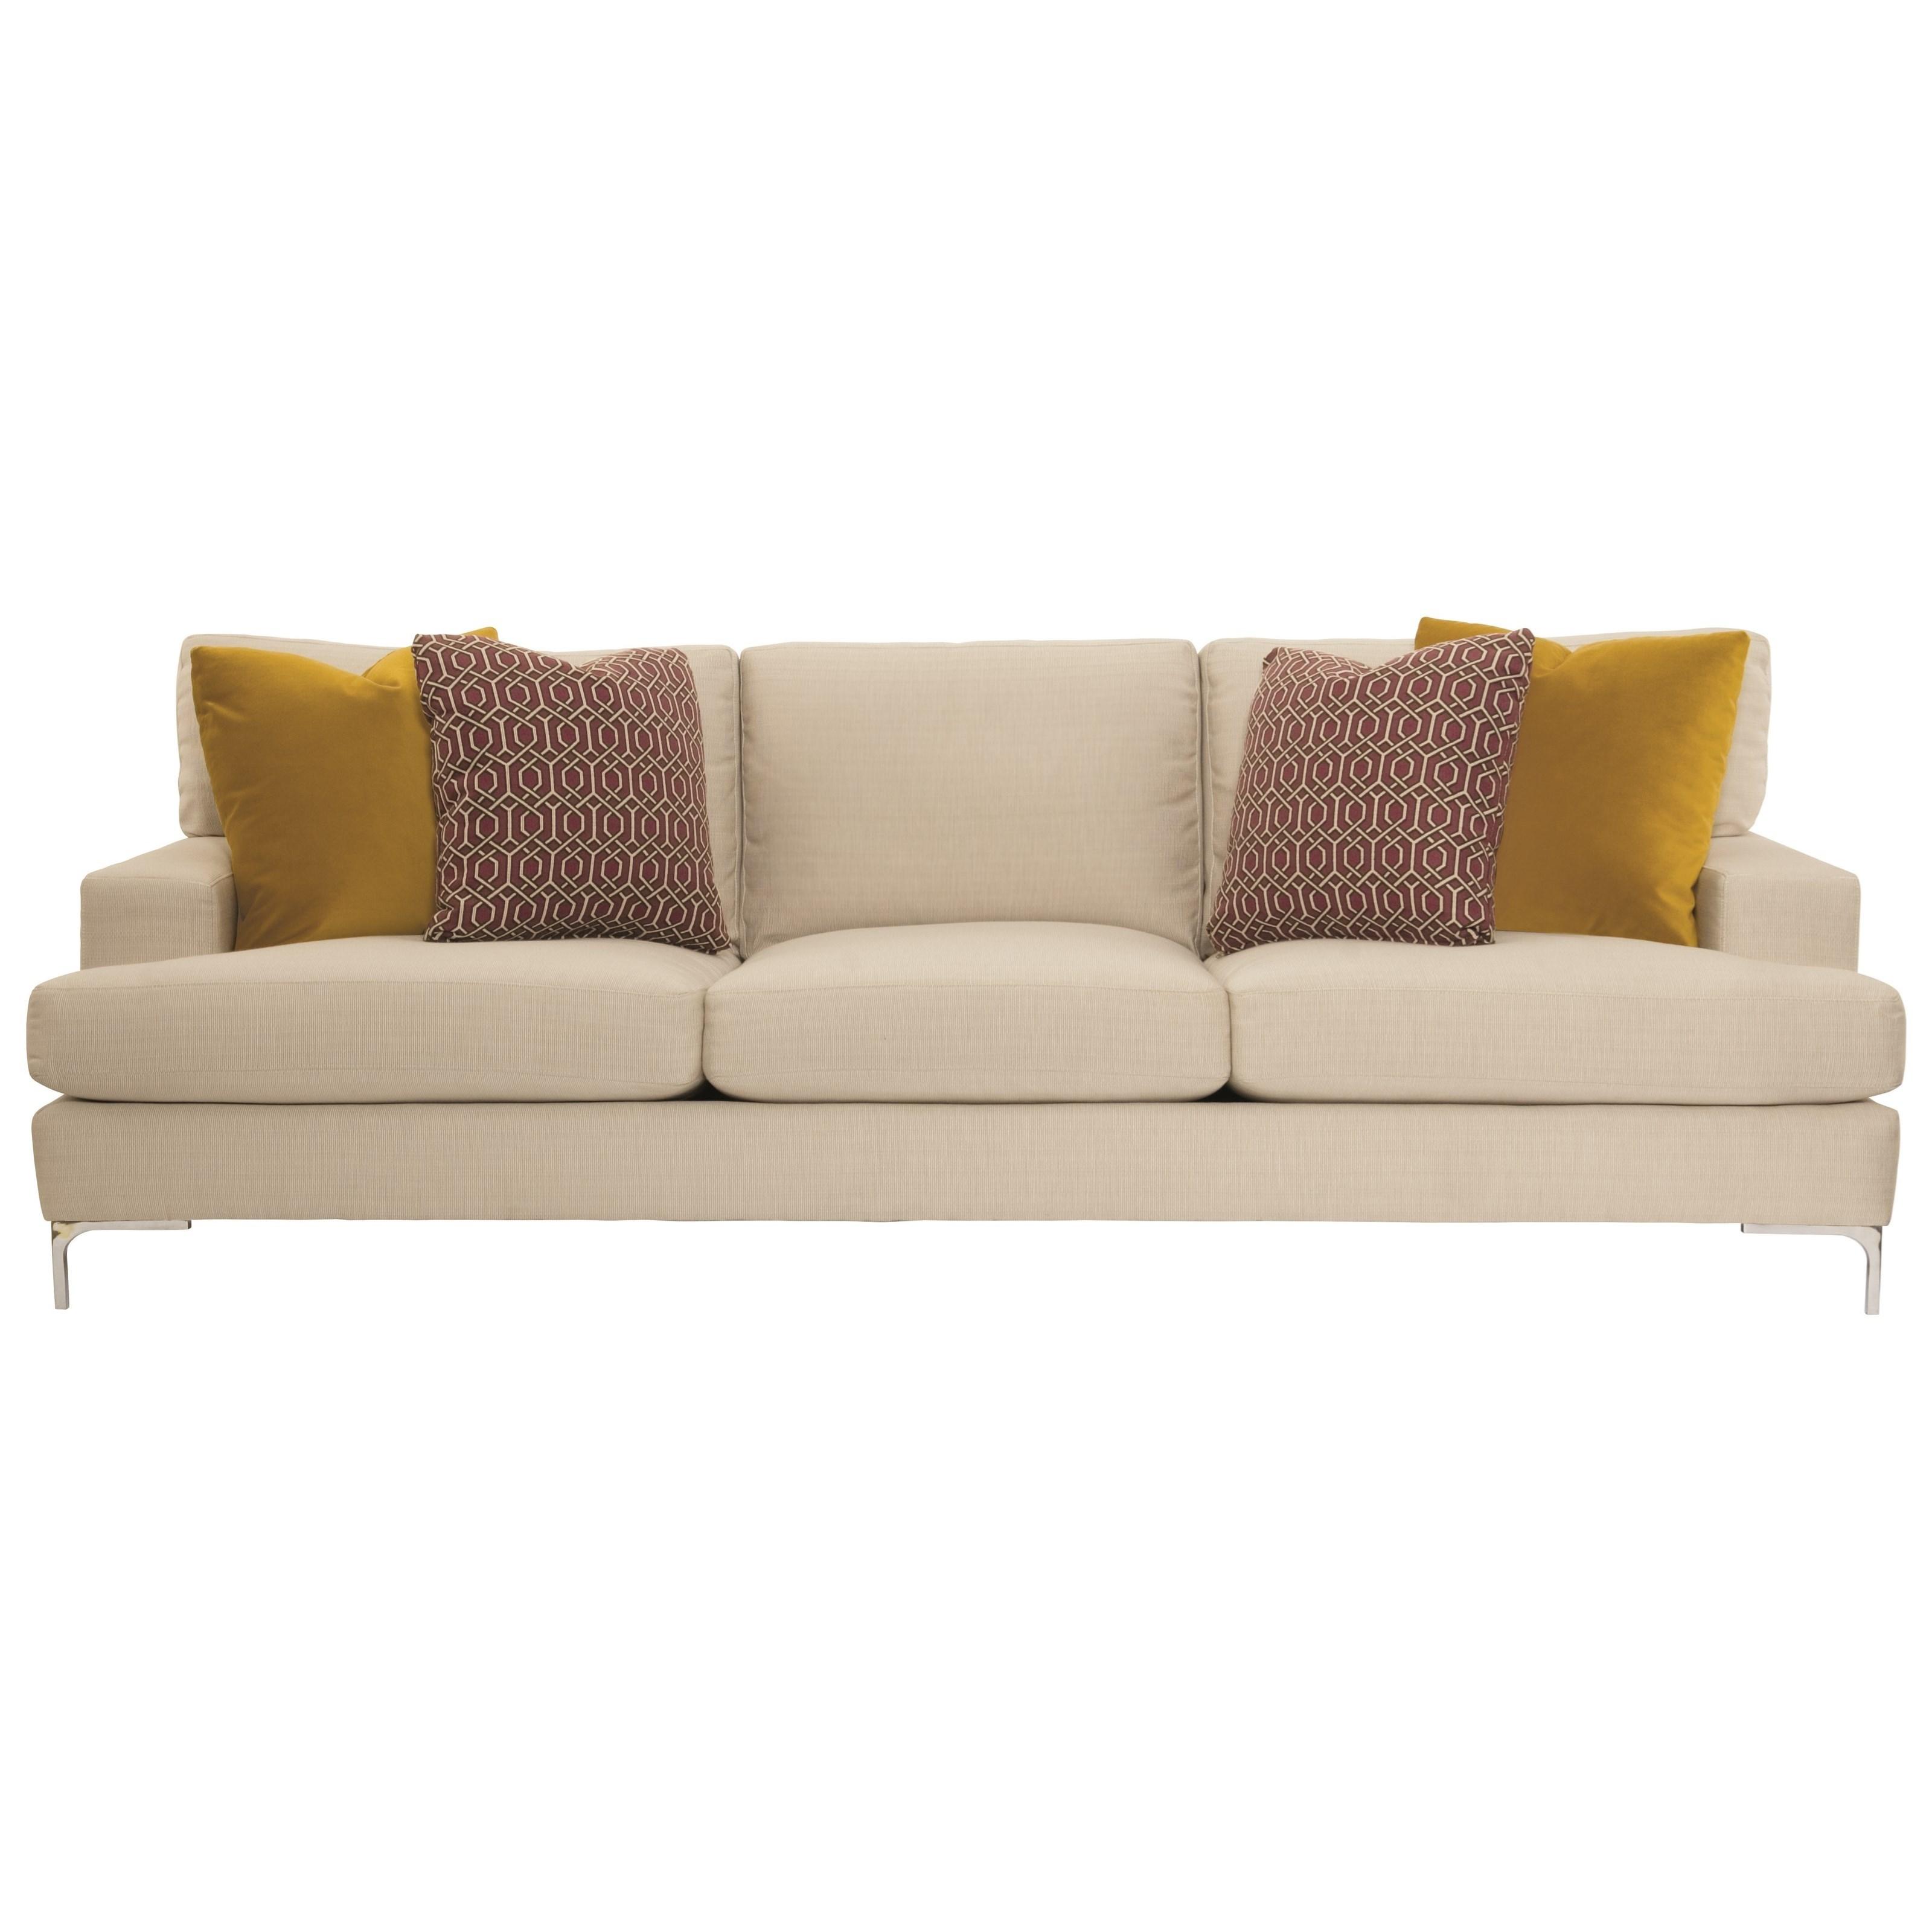 Bernhardt Carver Sofa Jacksonville Furniture Mart Sofas